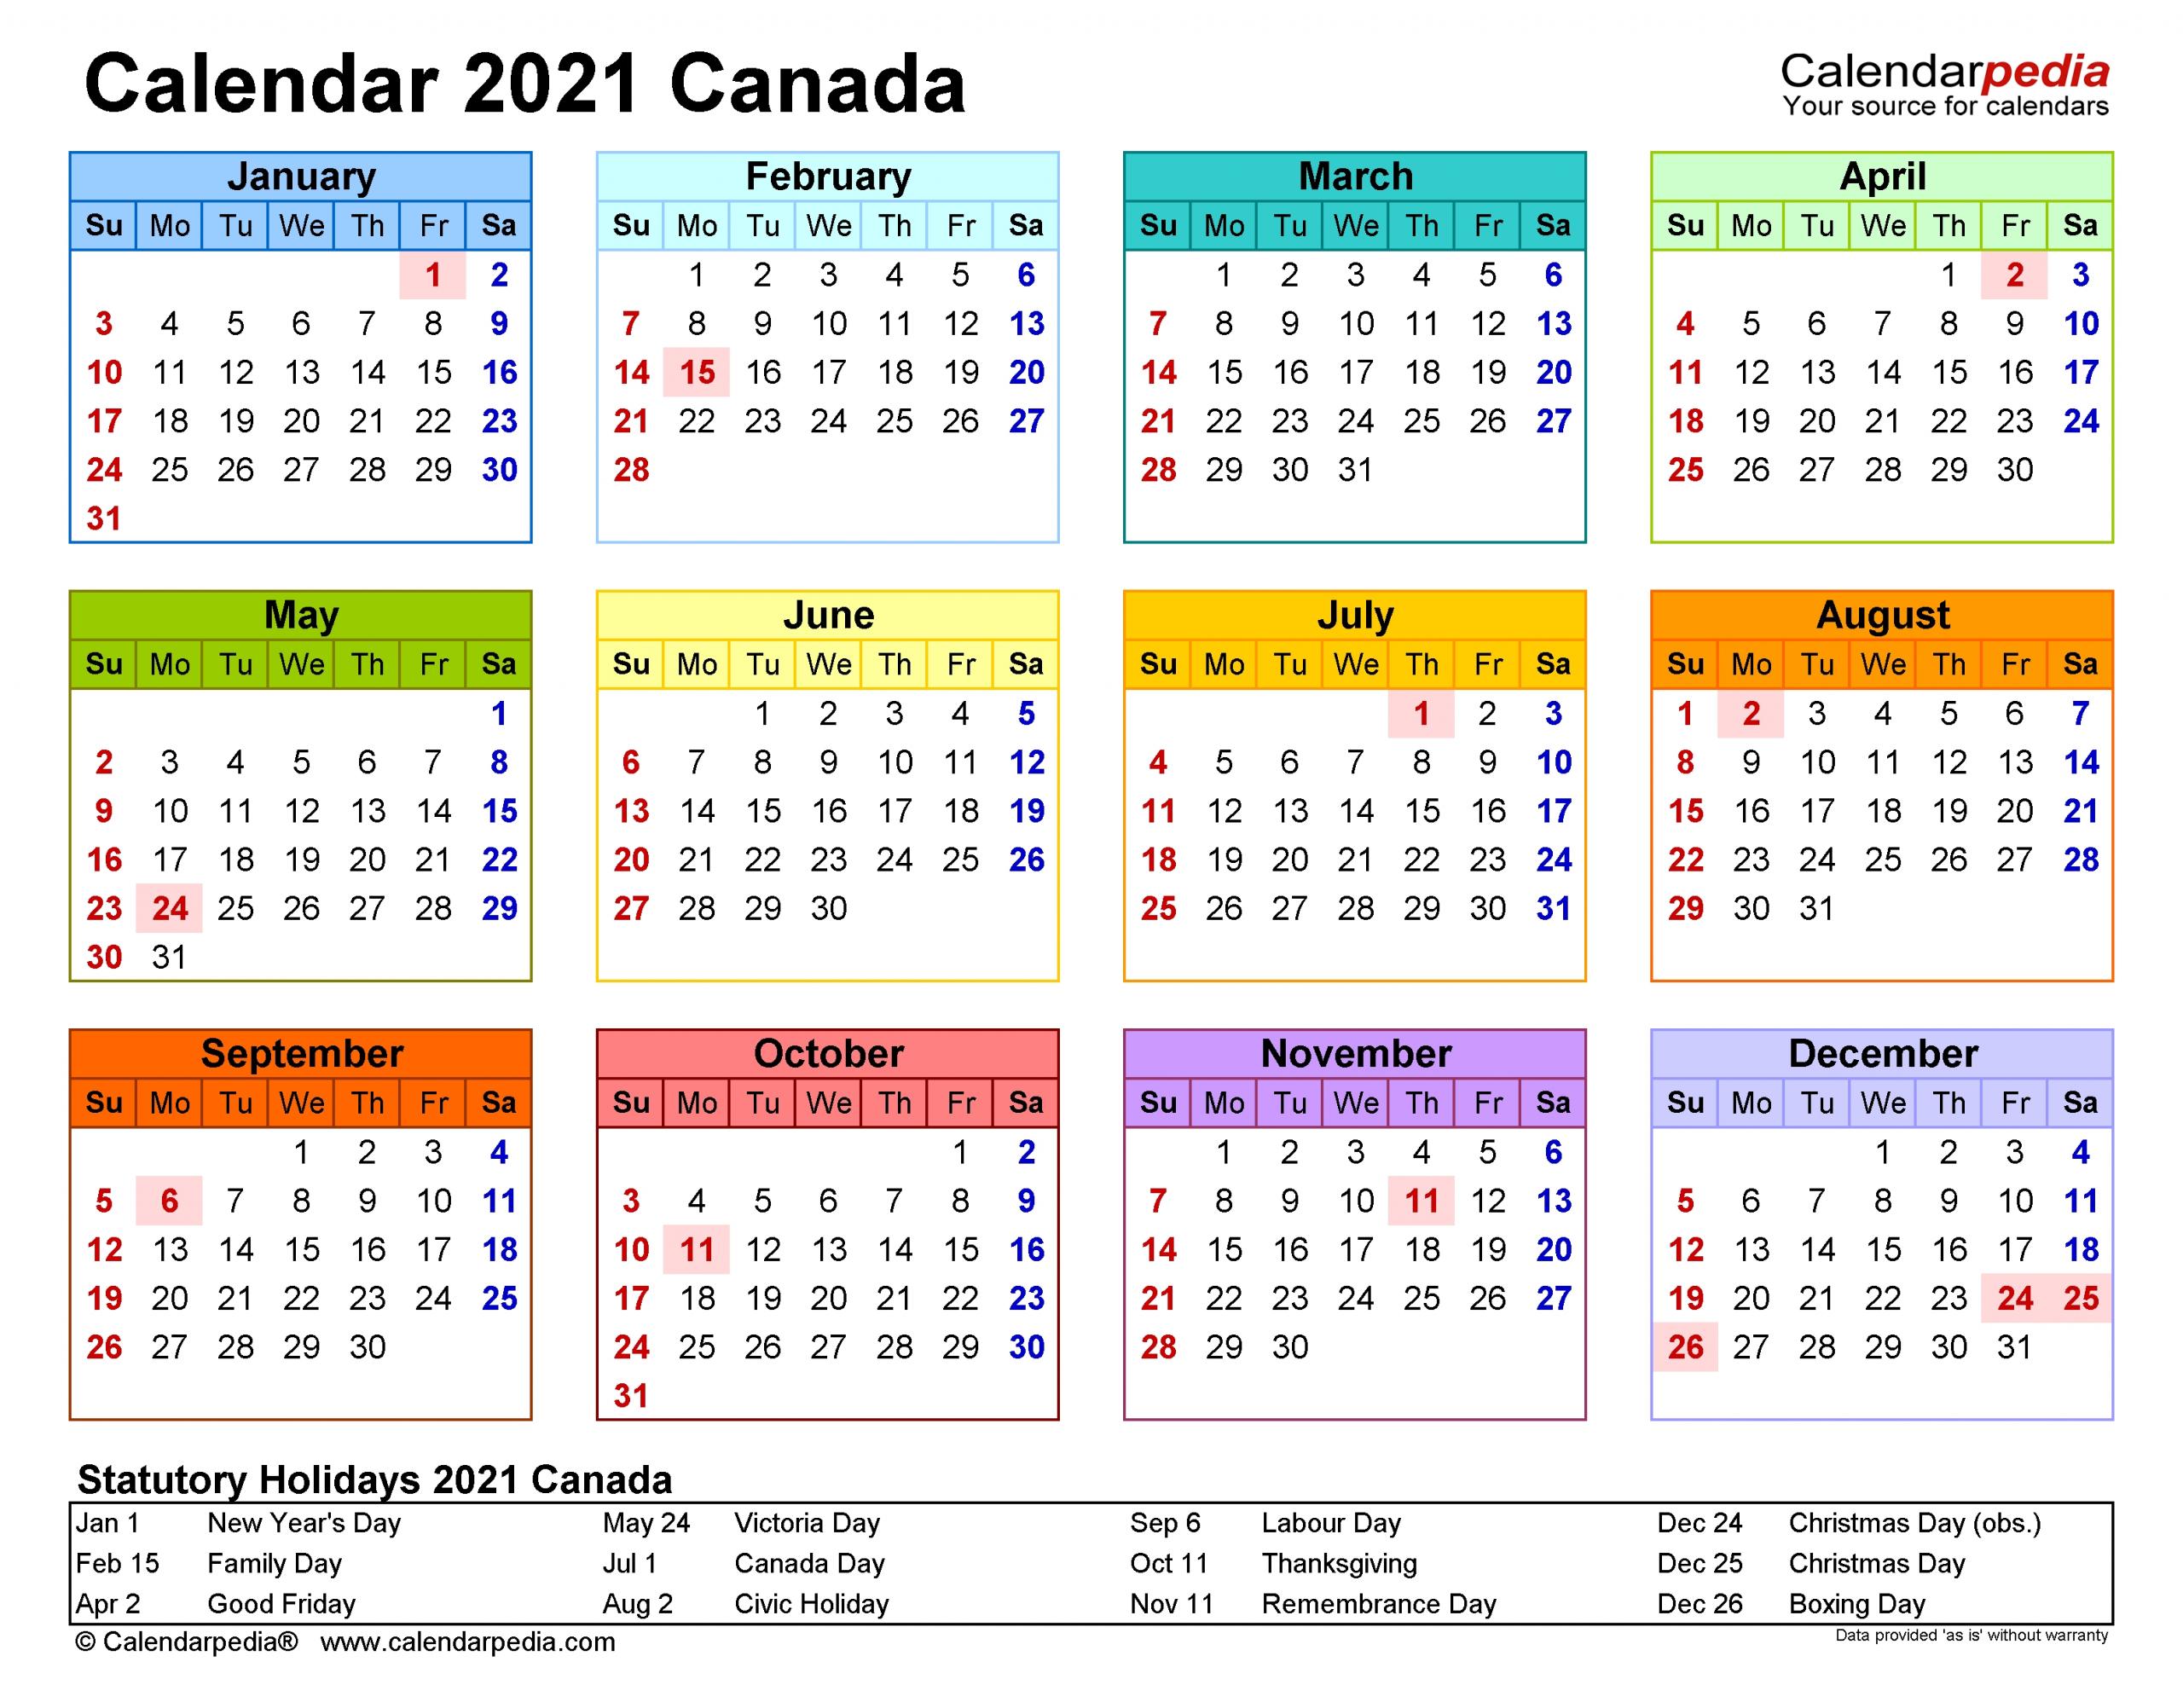 Canada Calendar 2021 - Free Printable Excel Templates-Employee 2021 Yearly Vacation Calendar